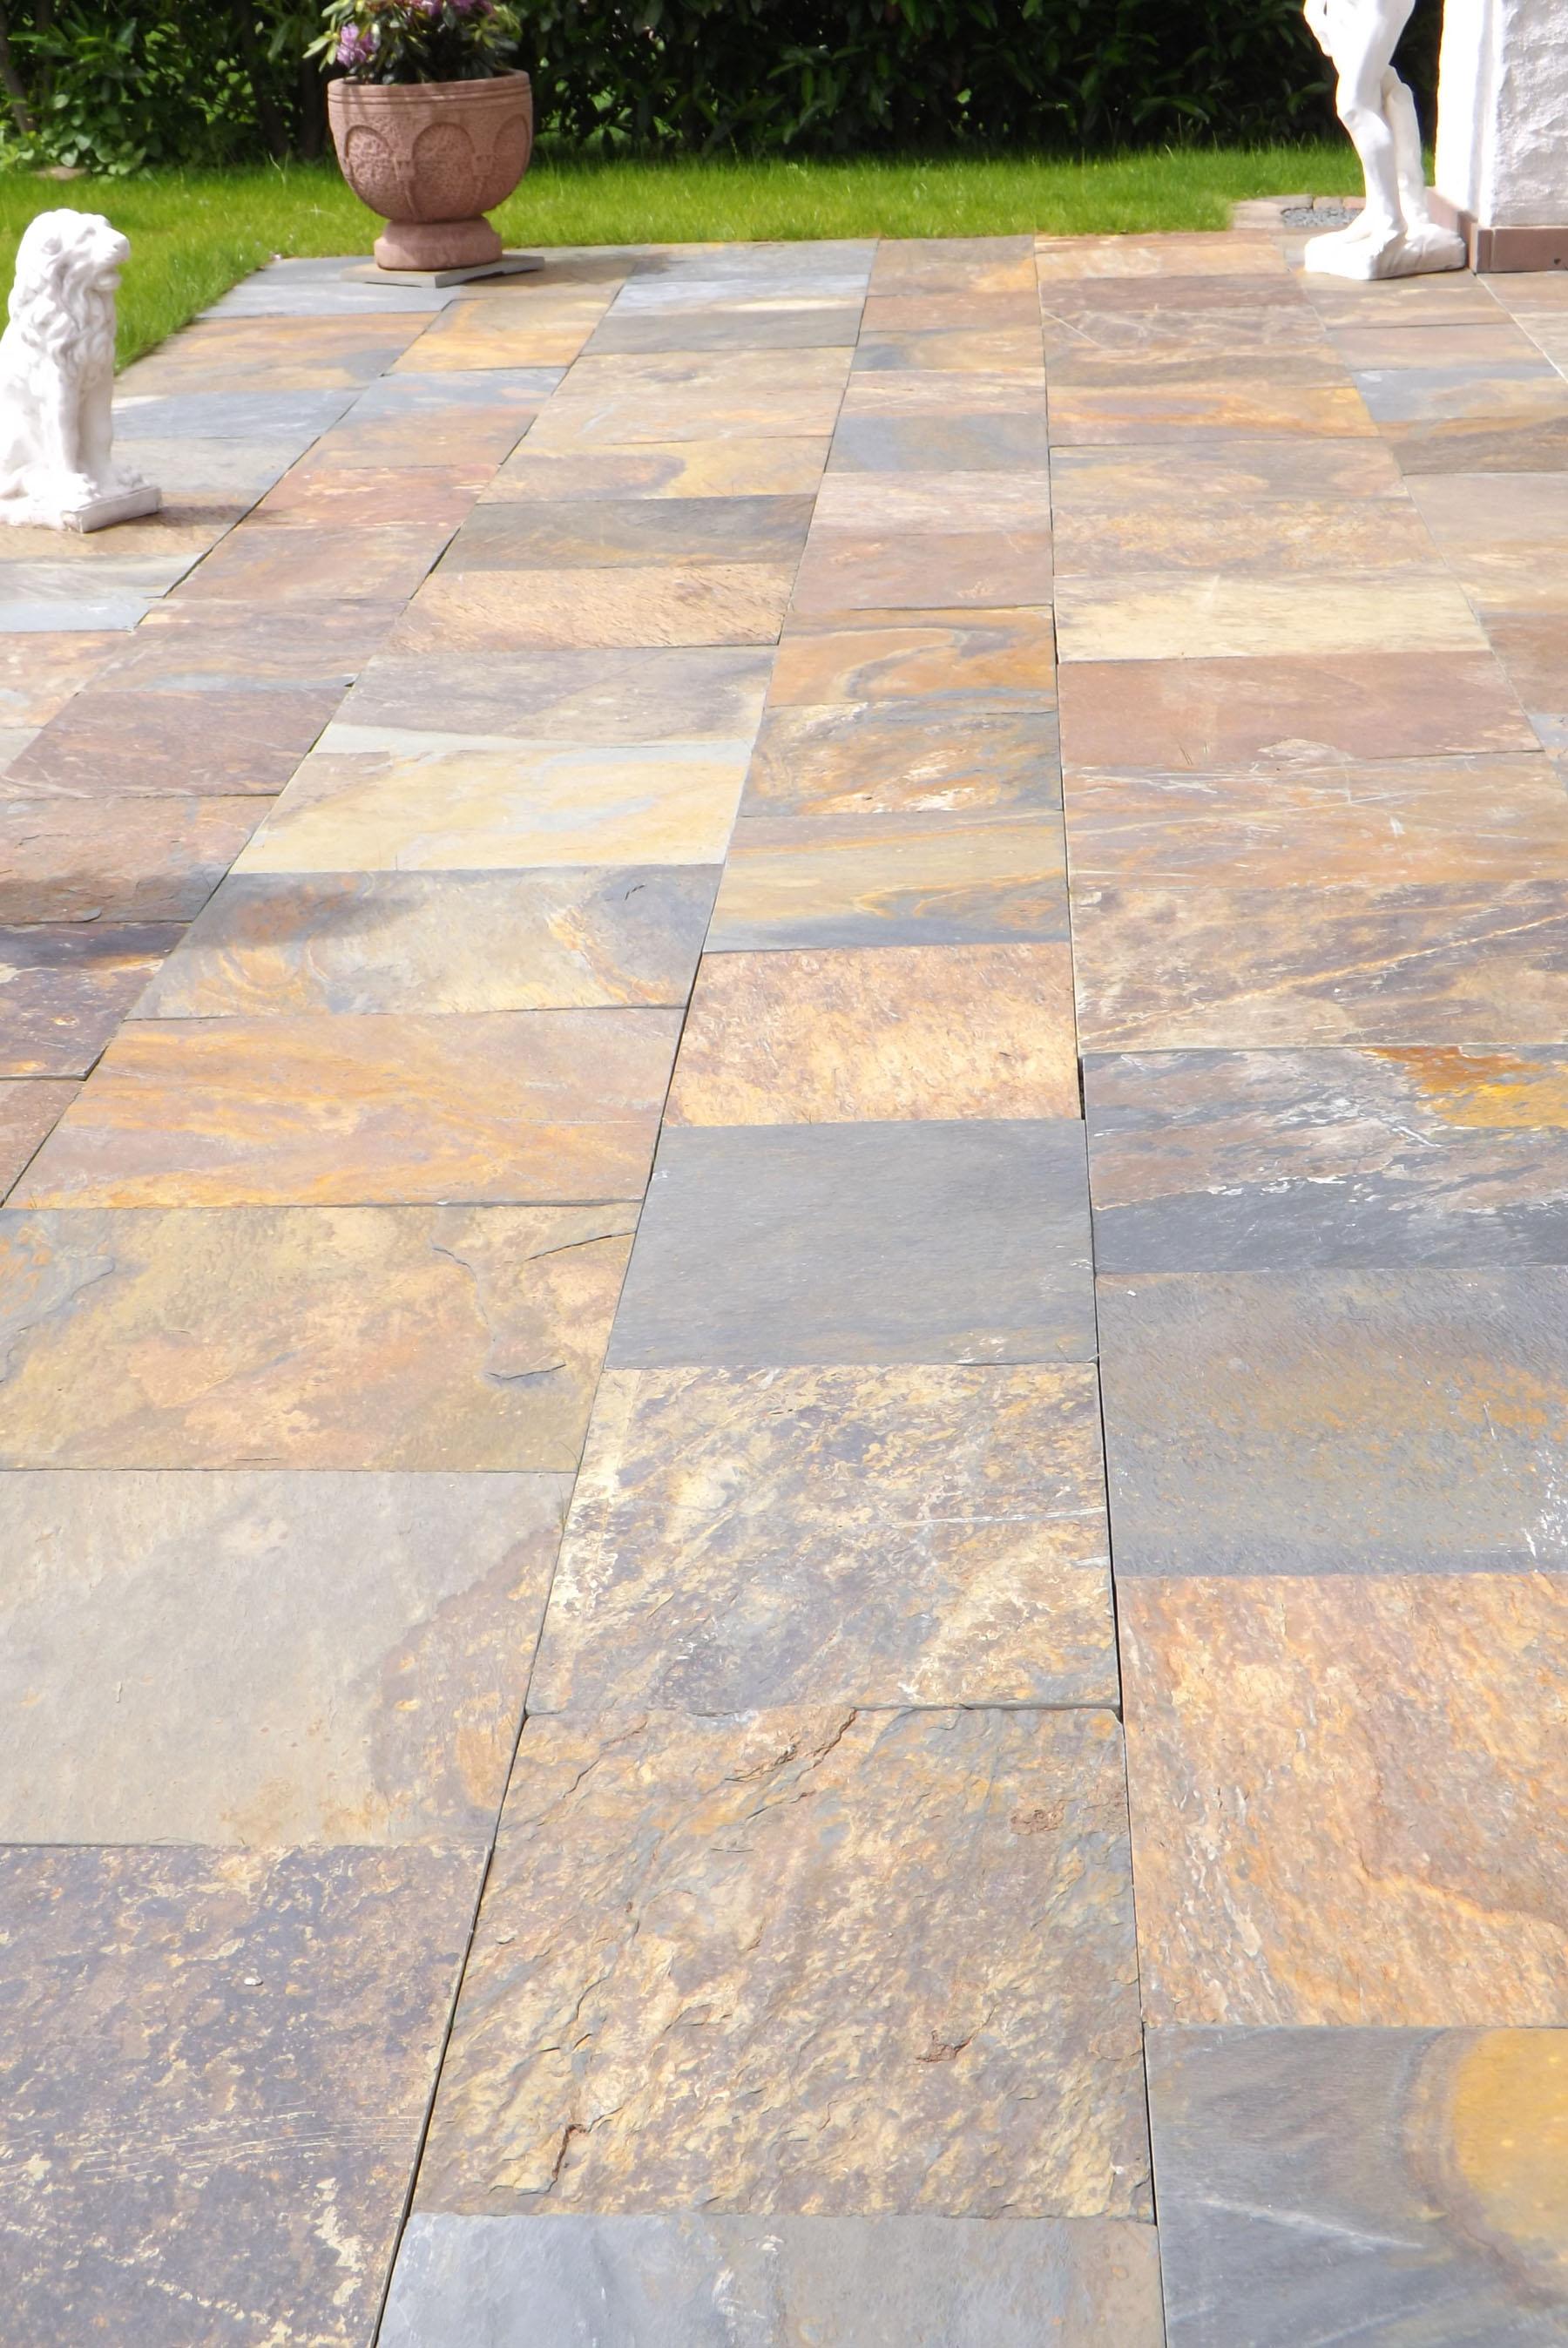 Schiefer Rusty Backes - Leichte terrassenplatten